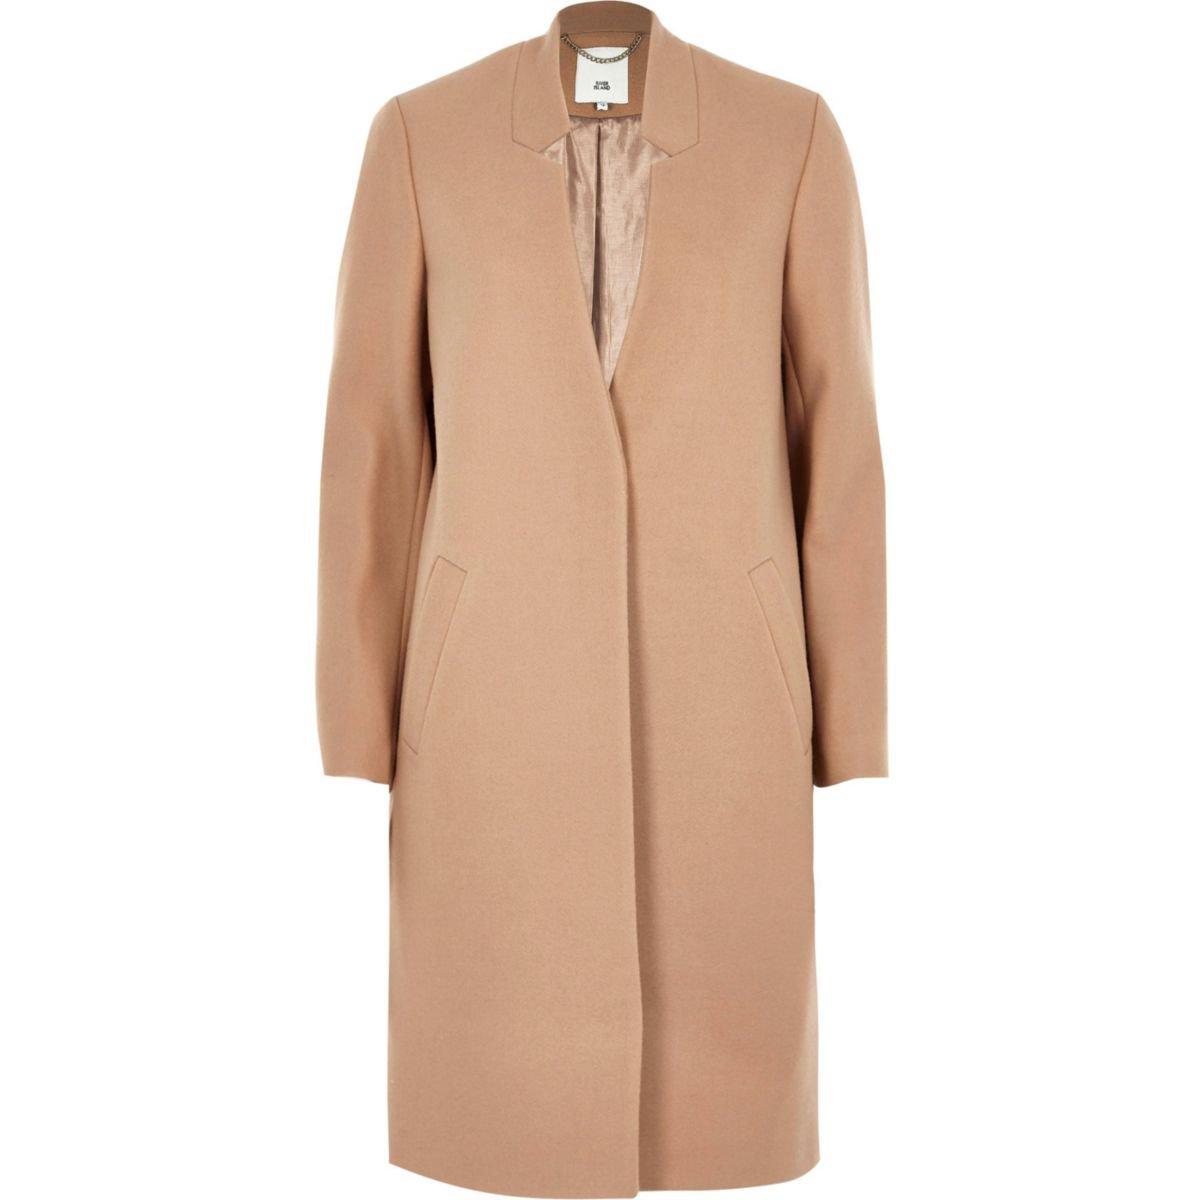 Camel knit collarless longline coat - Coats - Coats & Jackets - women